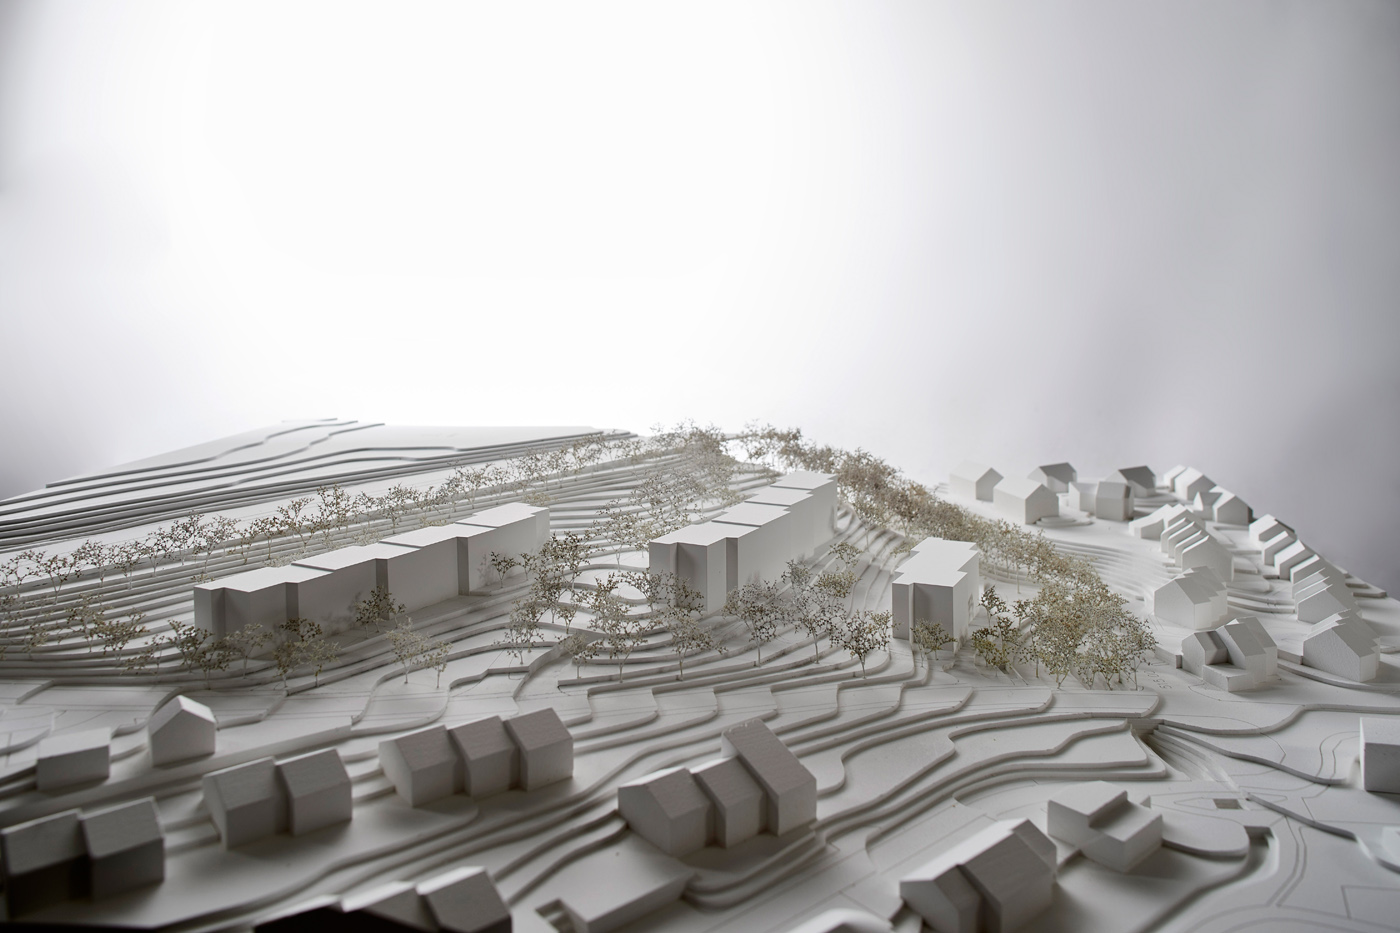 buan-architekten-wygart-sempach-modell-1